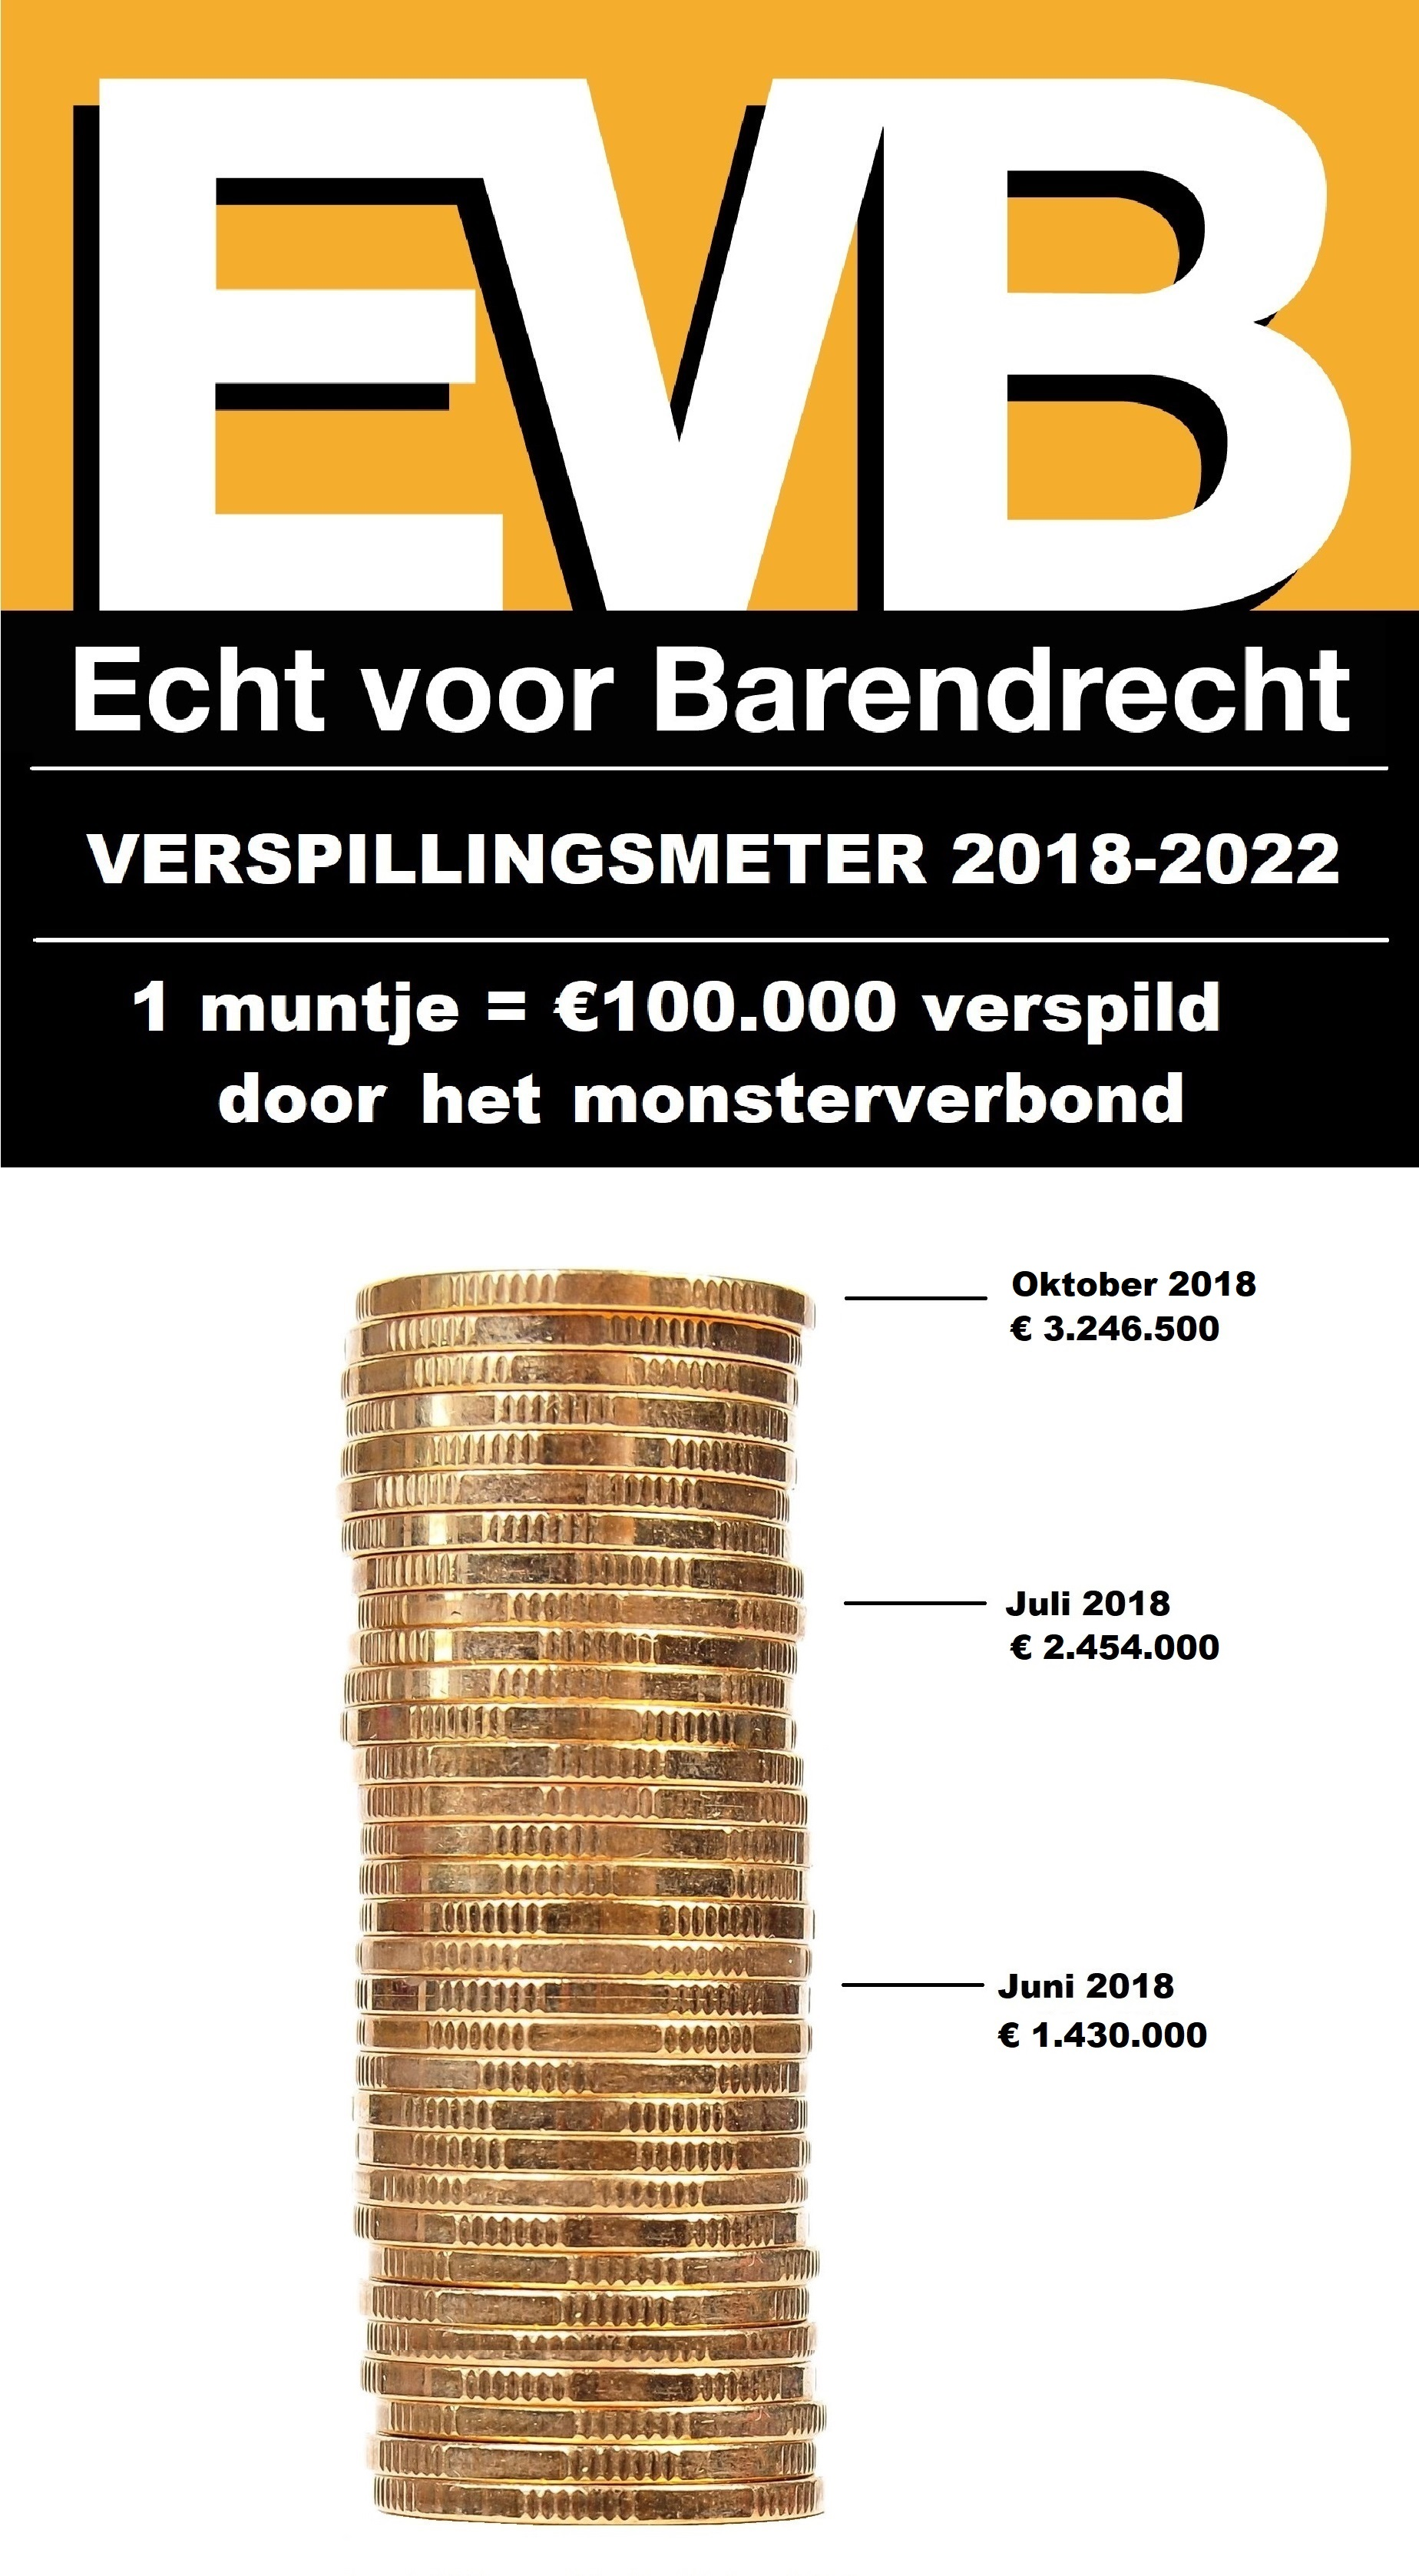 Verspillingsmeter 2018-2022